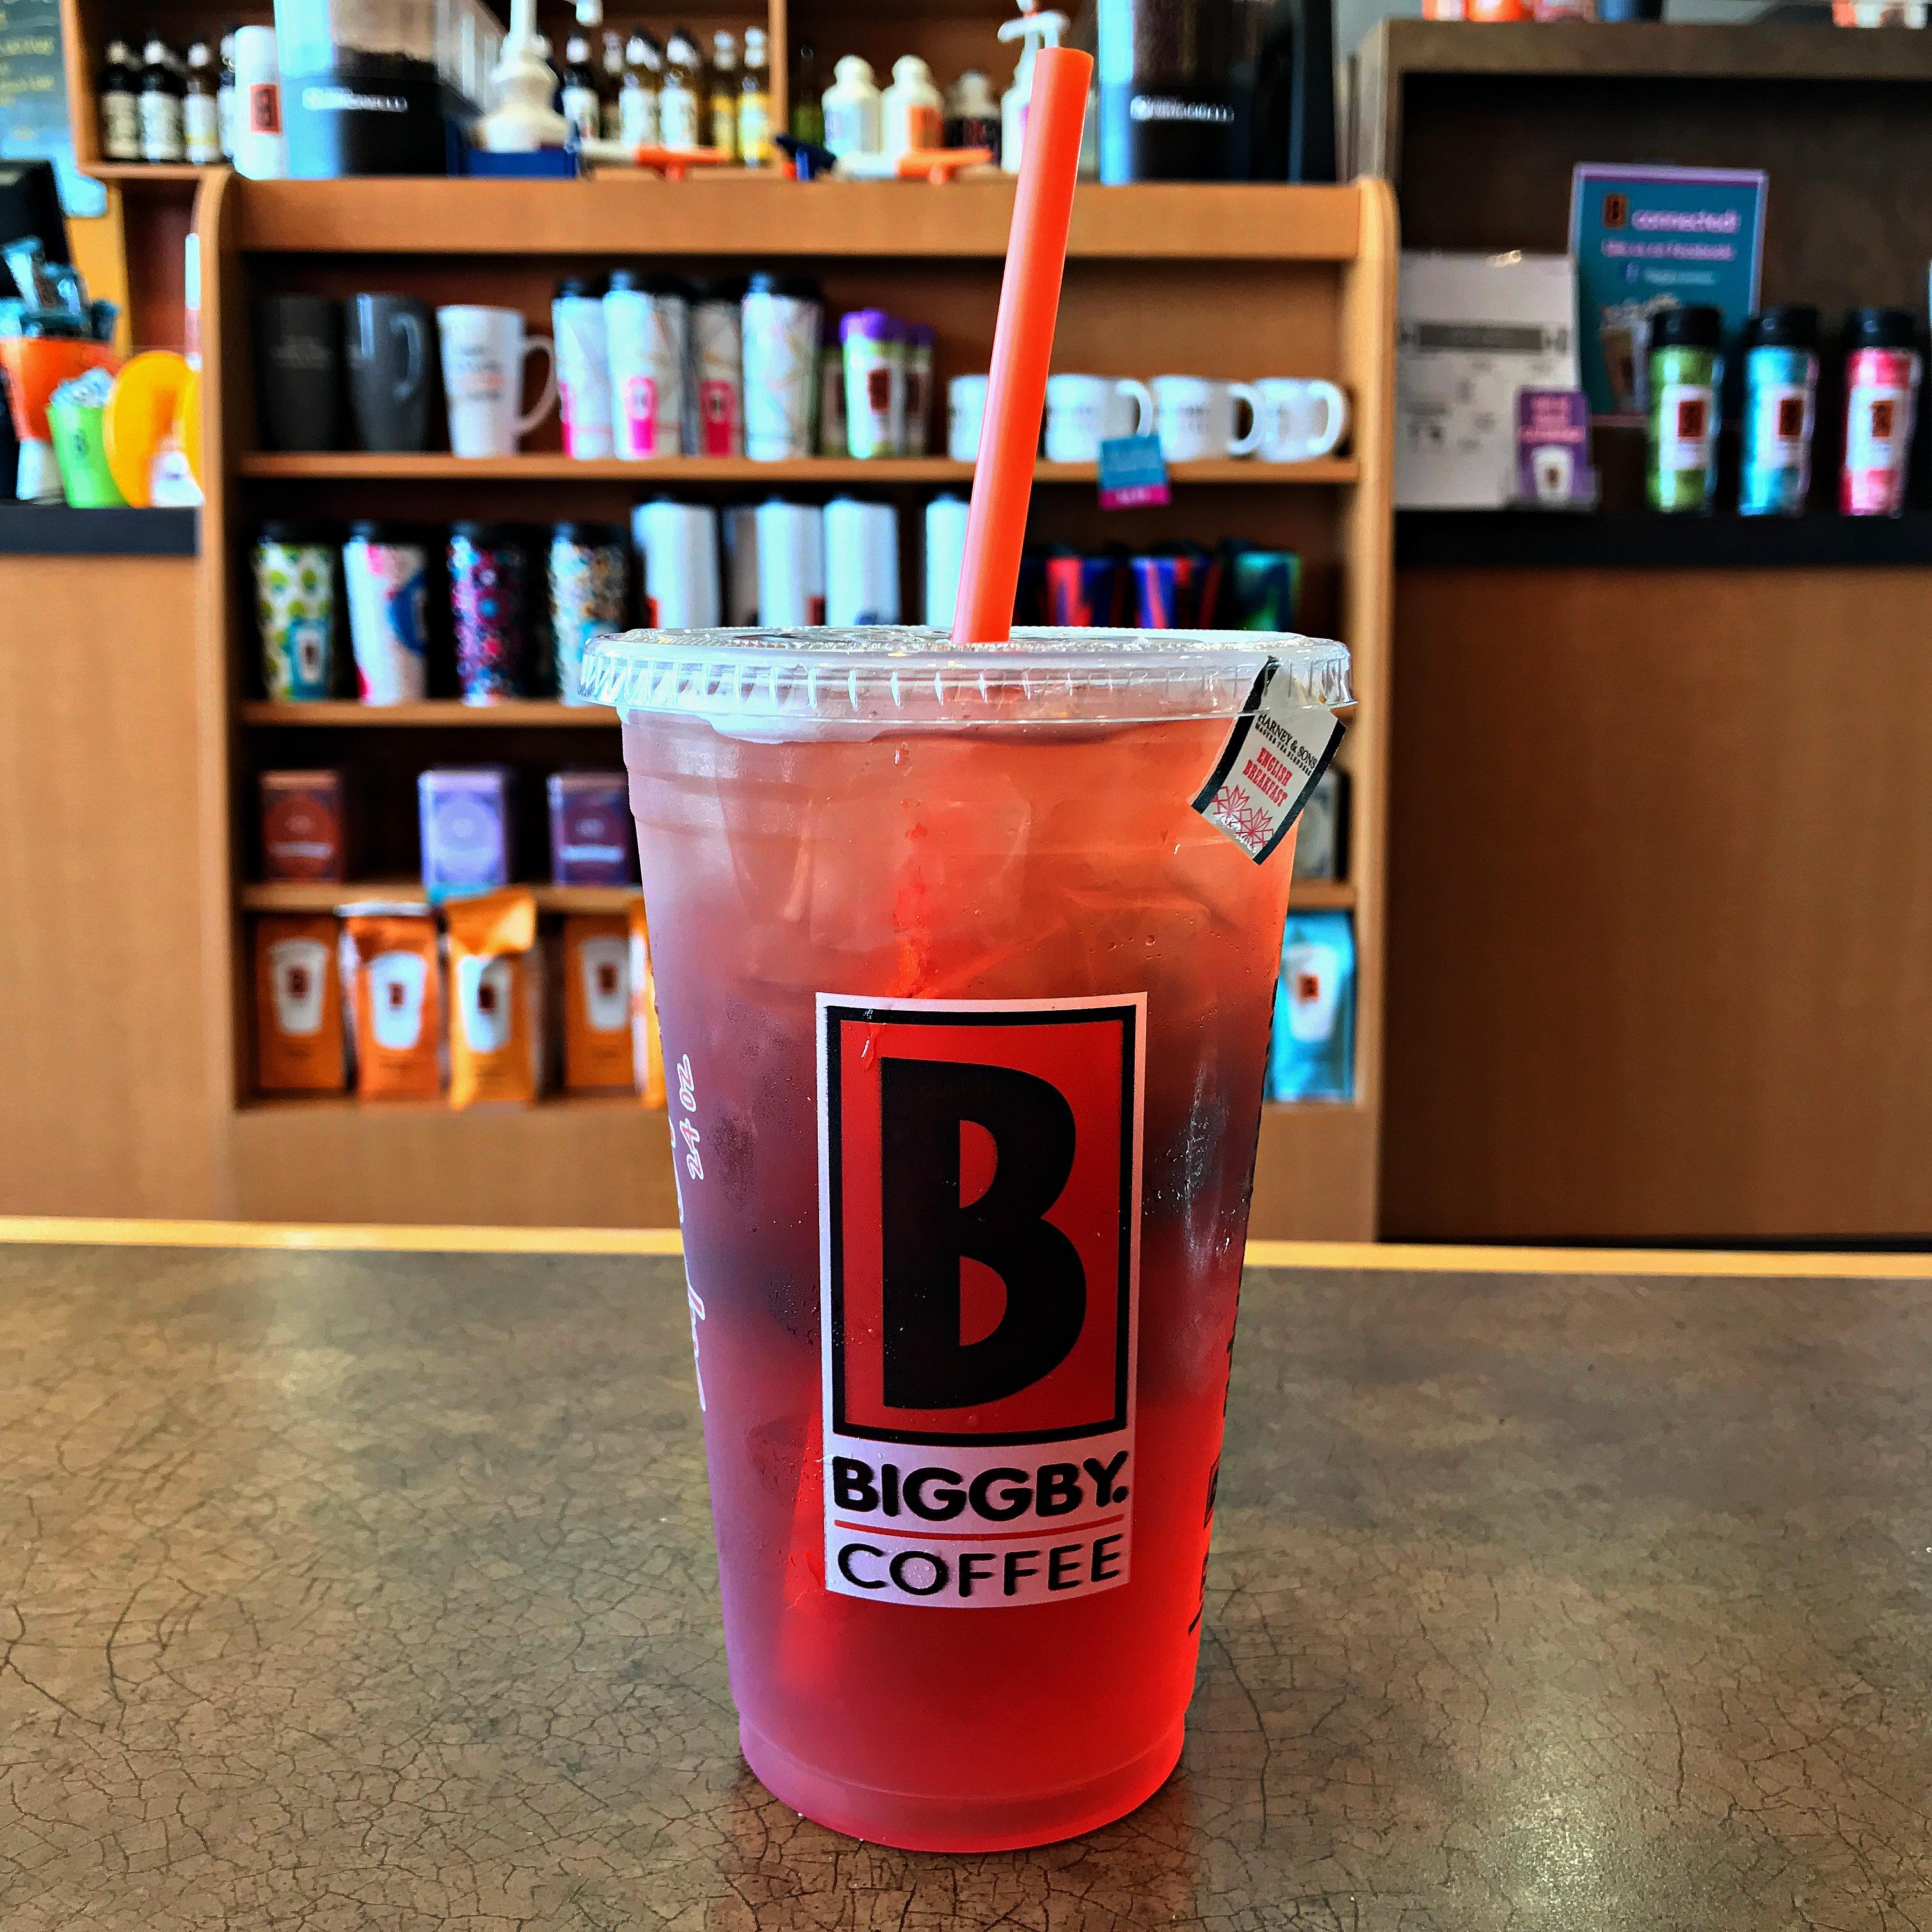 BIGGBY COFFEE image 1